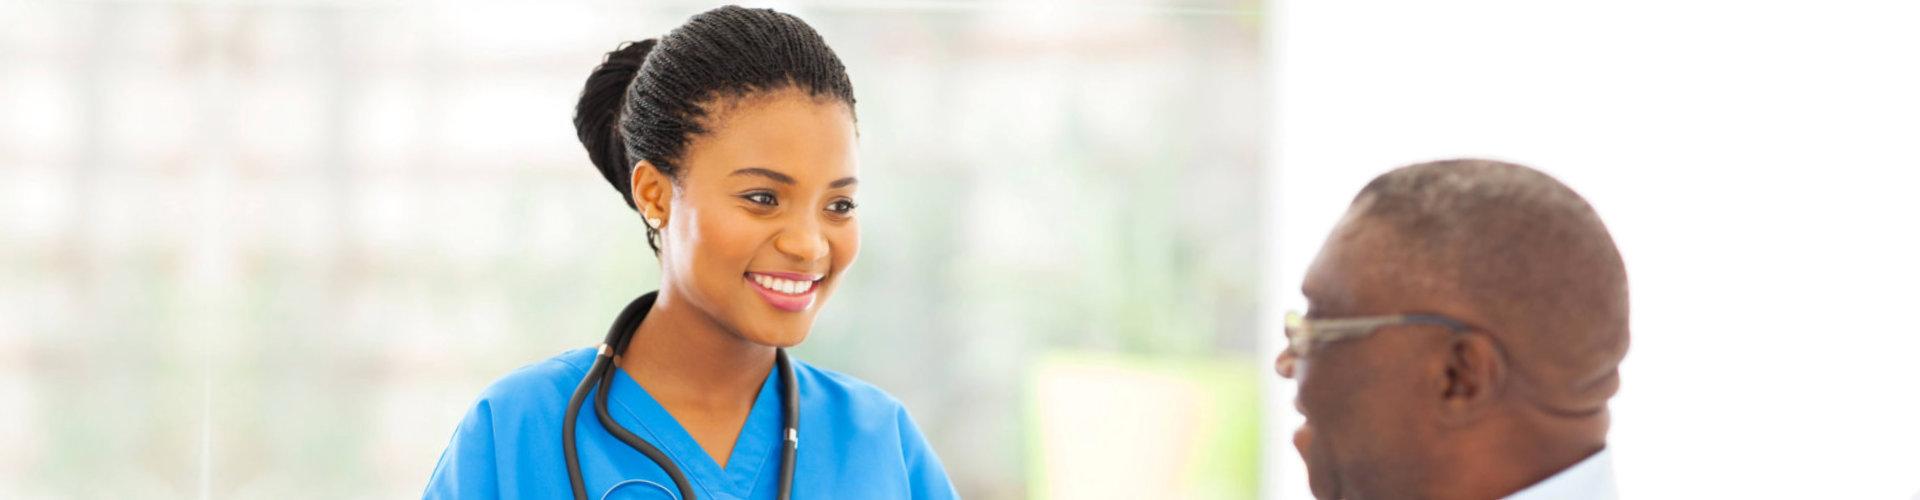 skilled nurse looking at the senior man while smiling